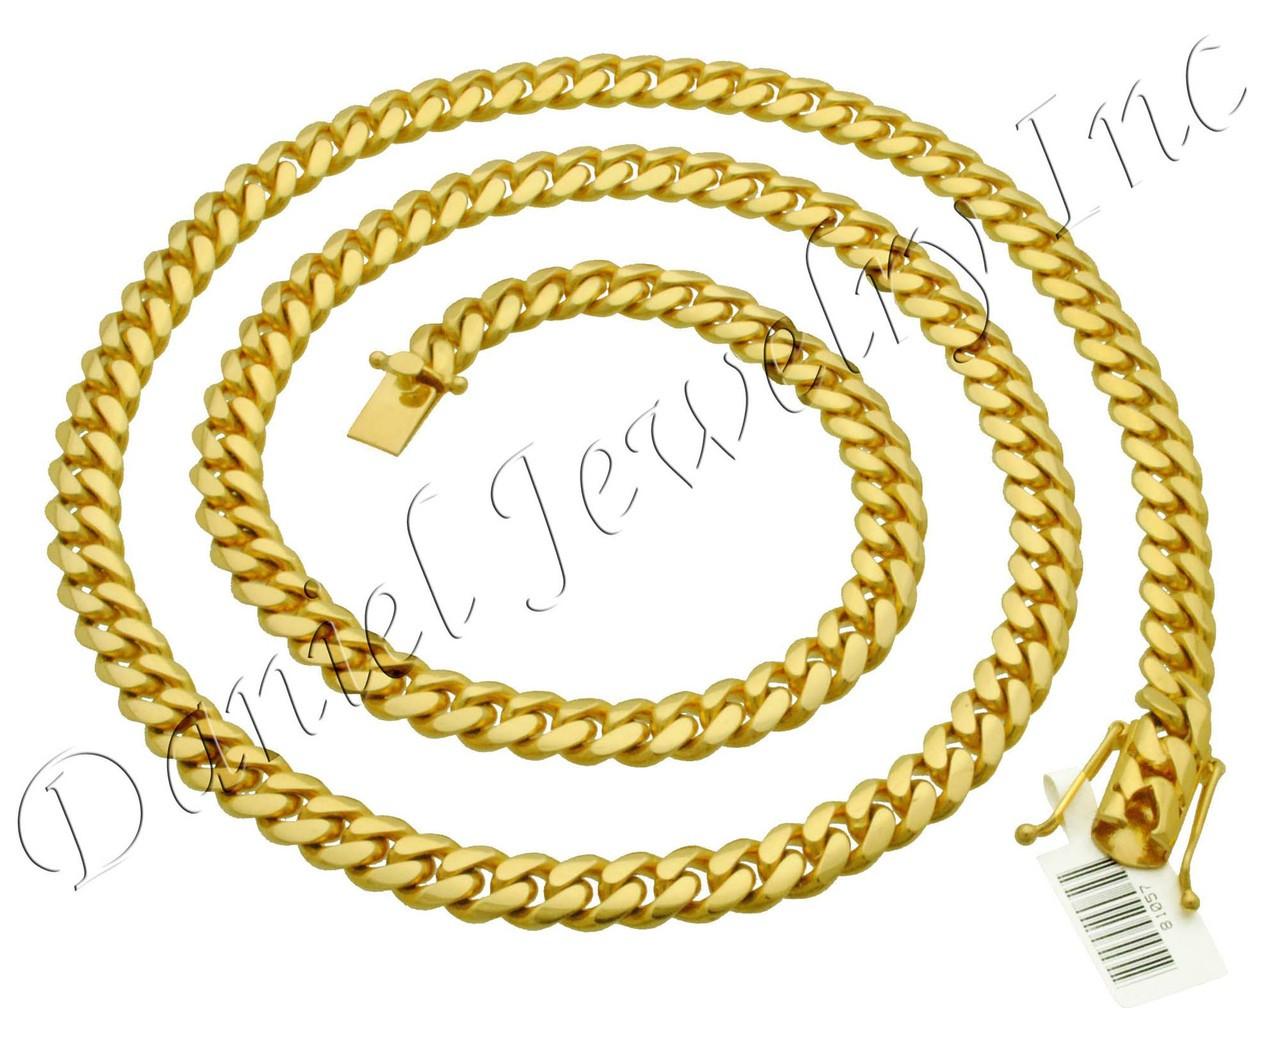 8f07ffa31739f2 ... 9mm Miami Cuban Link 18k Chain. Image 1